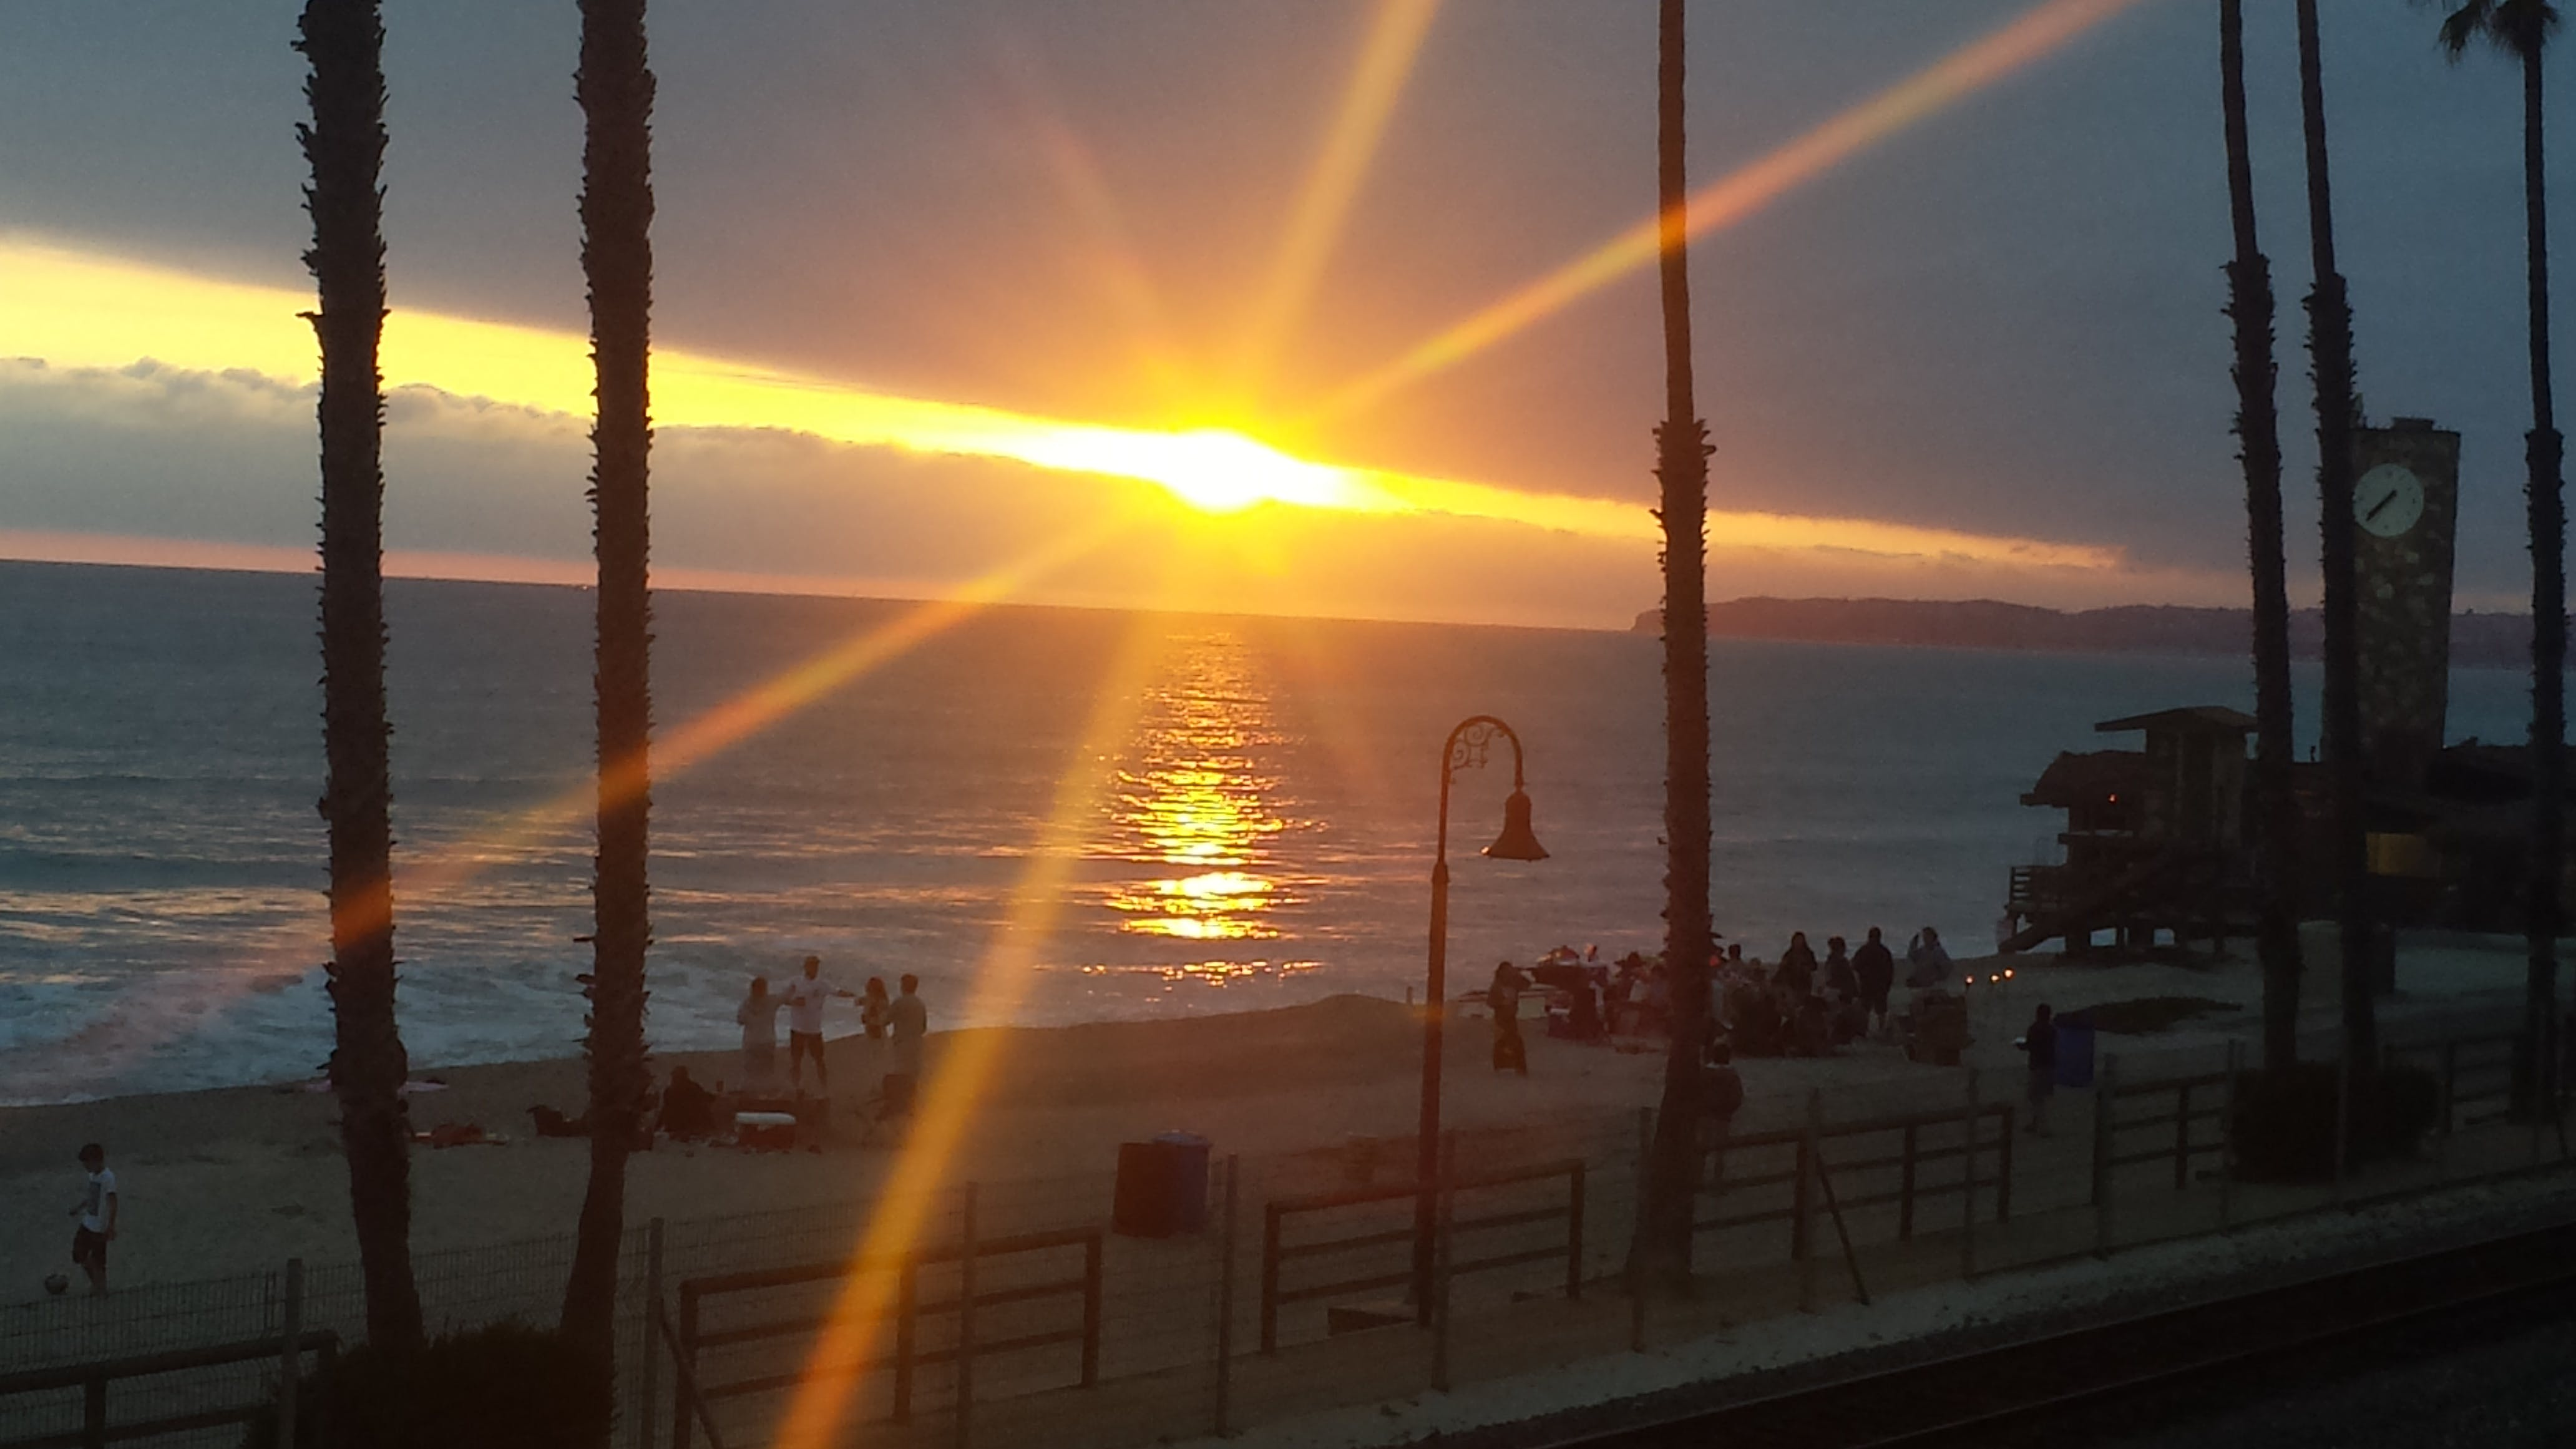 Free stock photo of beach sunset, sunset at San Clemente, sunset beach